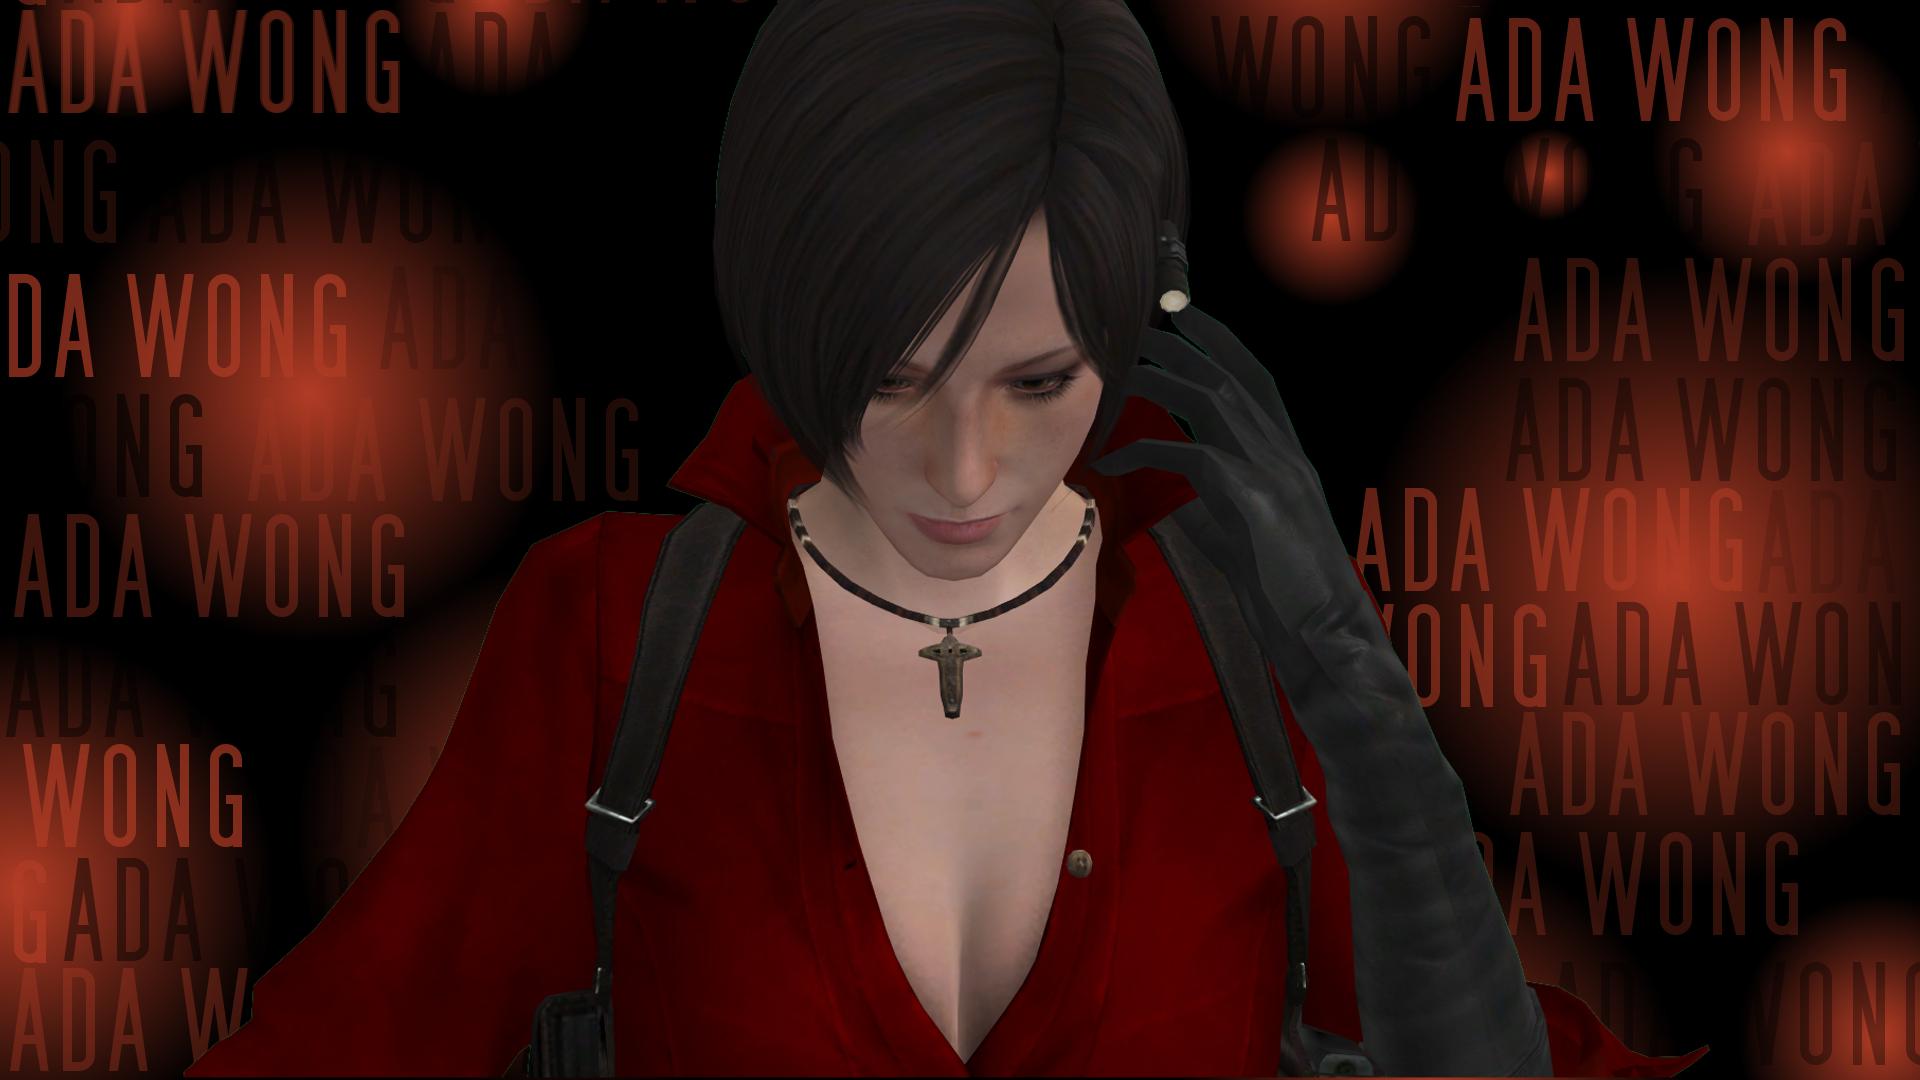 Wallpaper - Ada Wong - Resident Evil 6 by leo77940 on ...